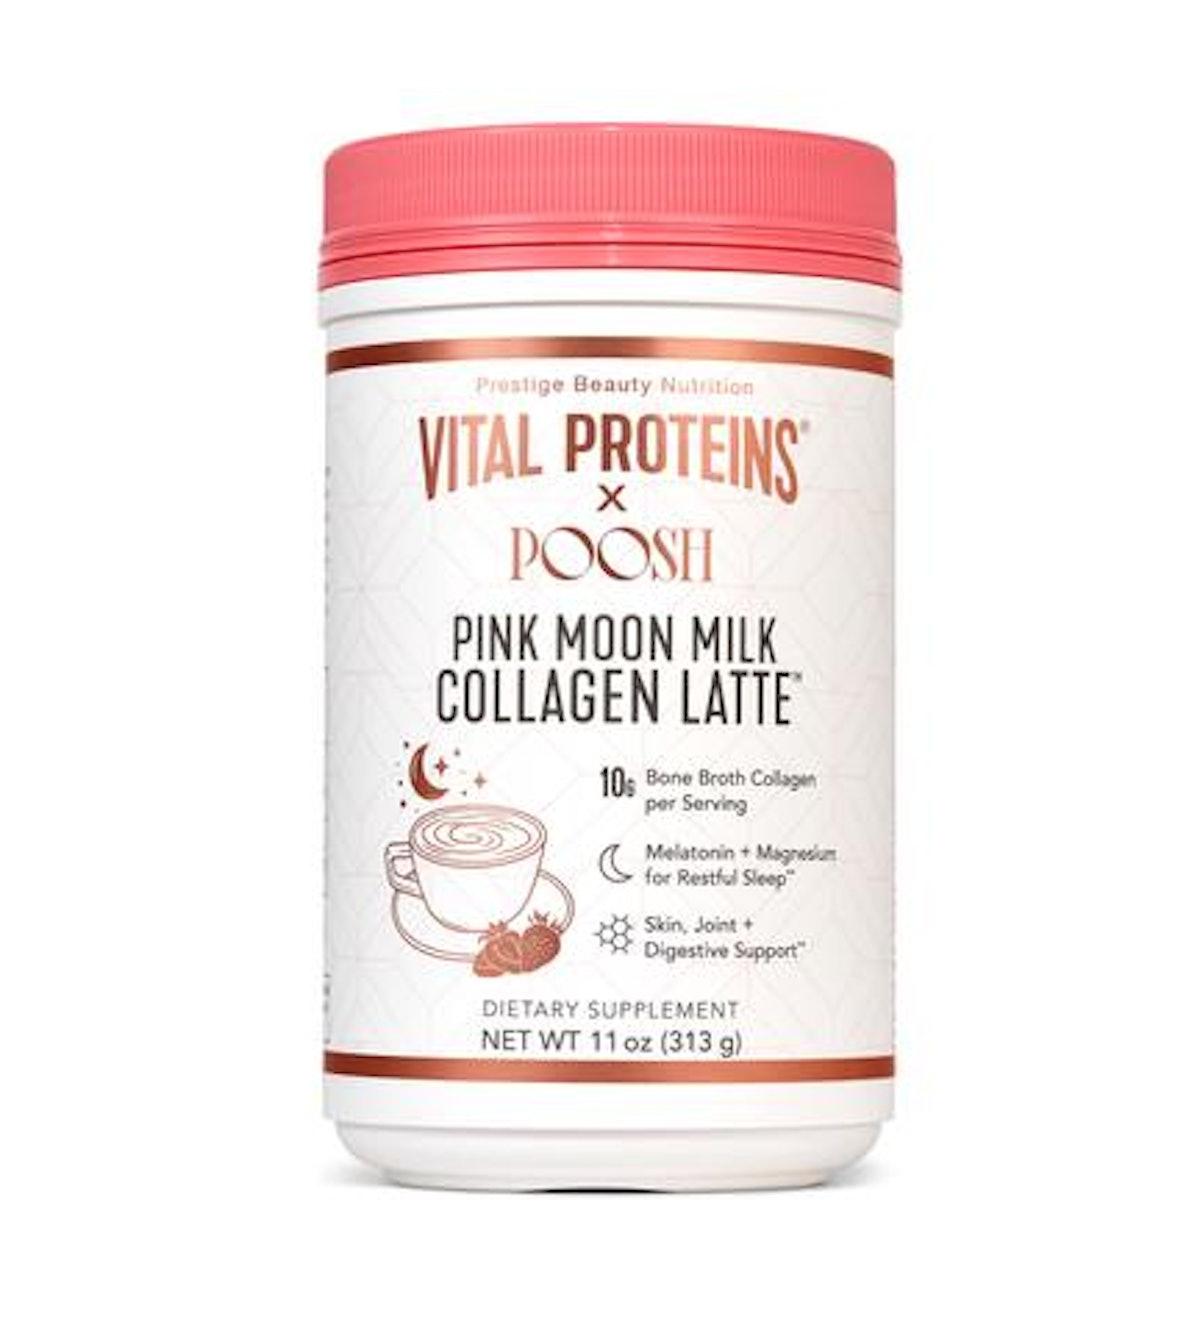 Pink Moon Milk Collagen Latte